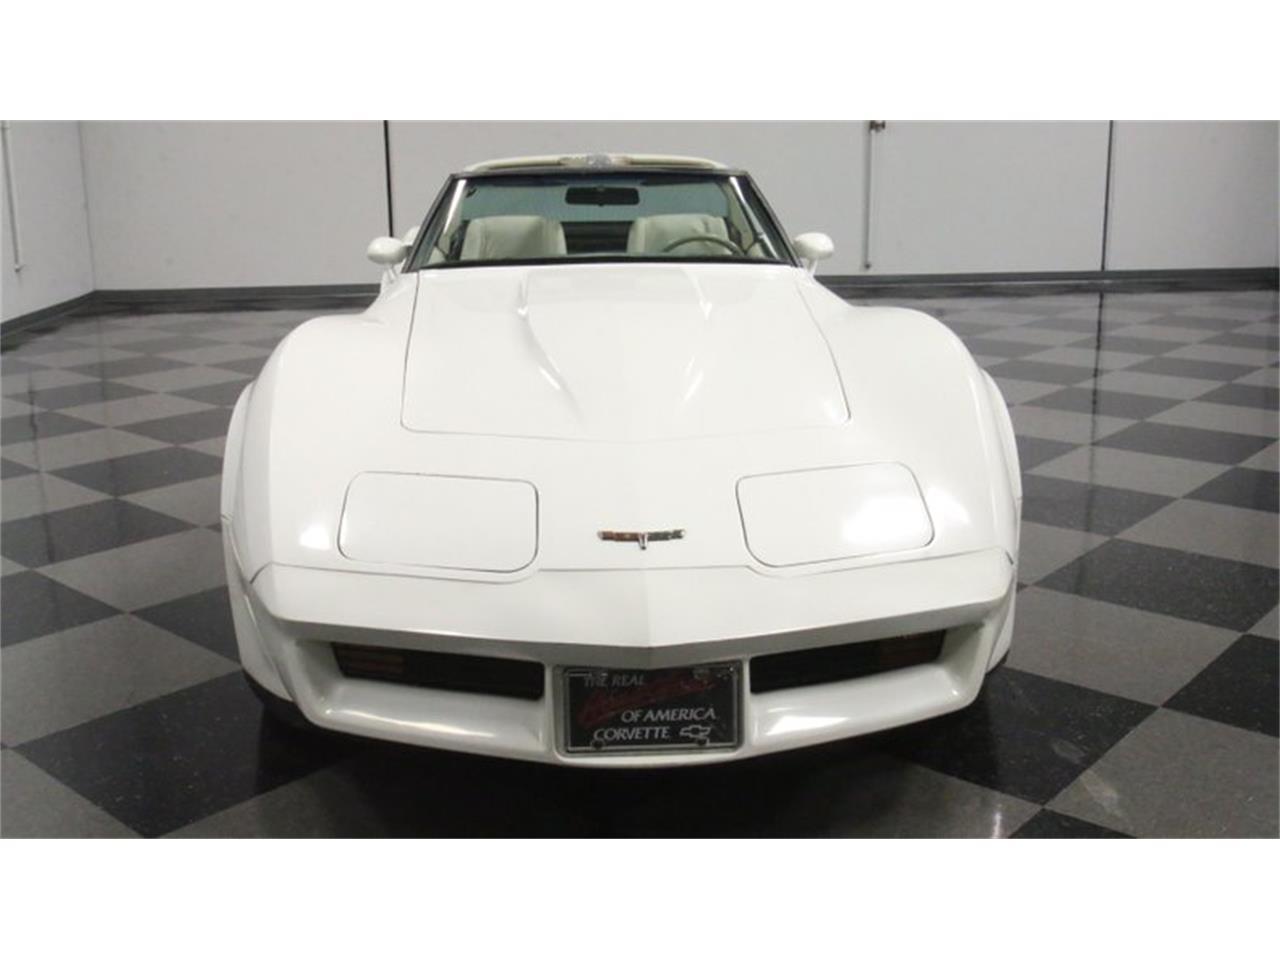 1980 Chevrolet Corvette (CC-1275446) for sale in Lithia Springs, Georgia